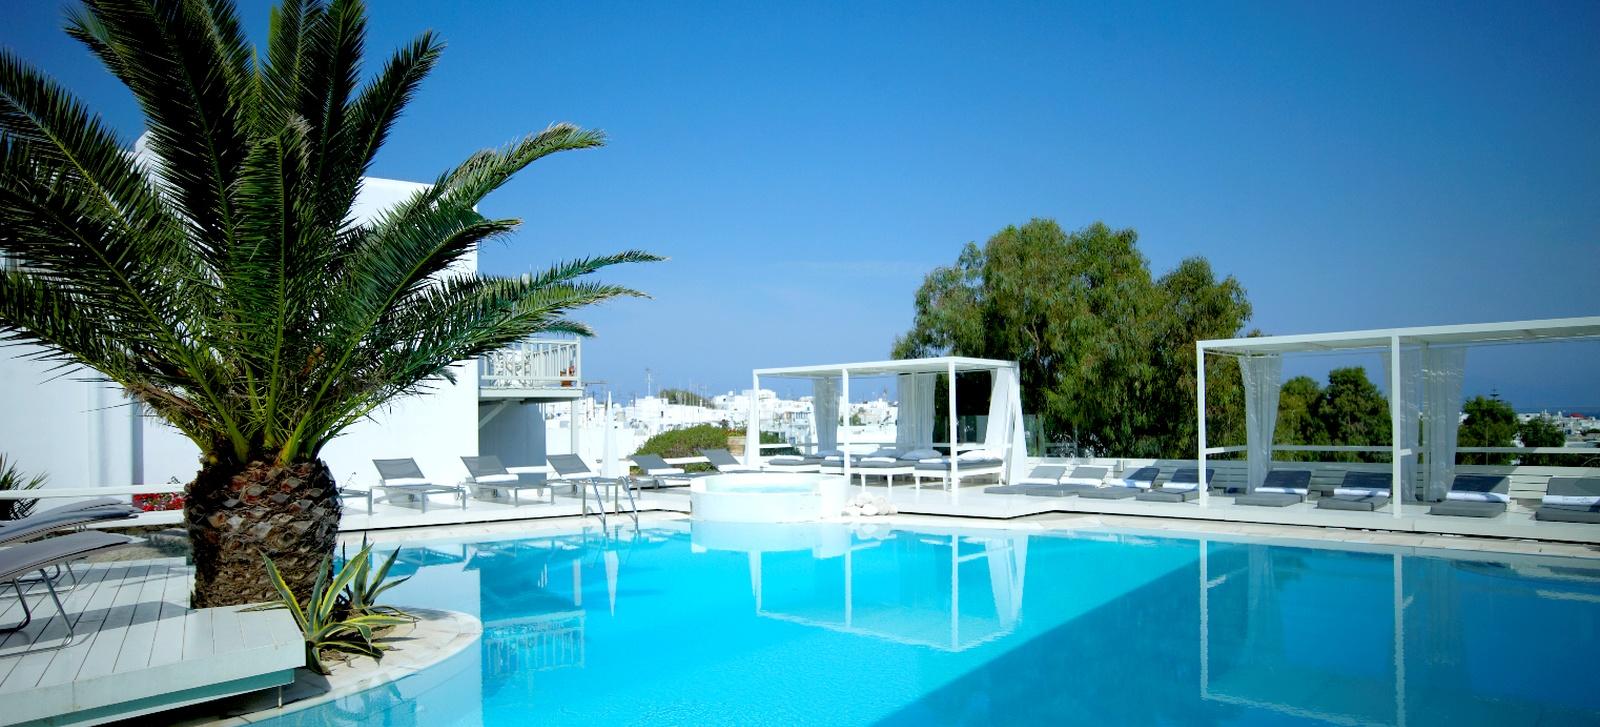 Semeli Hotel & Spa